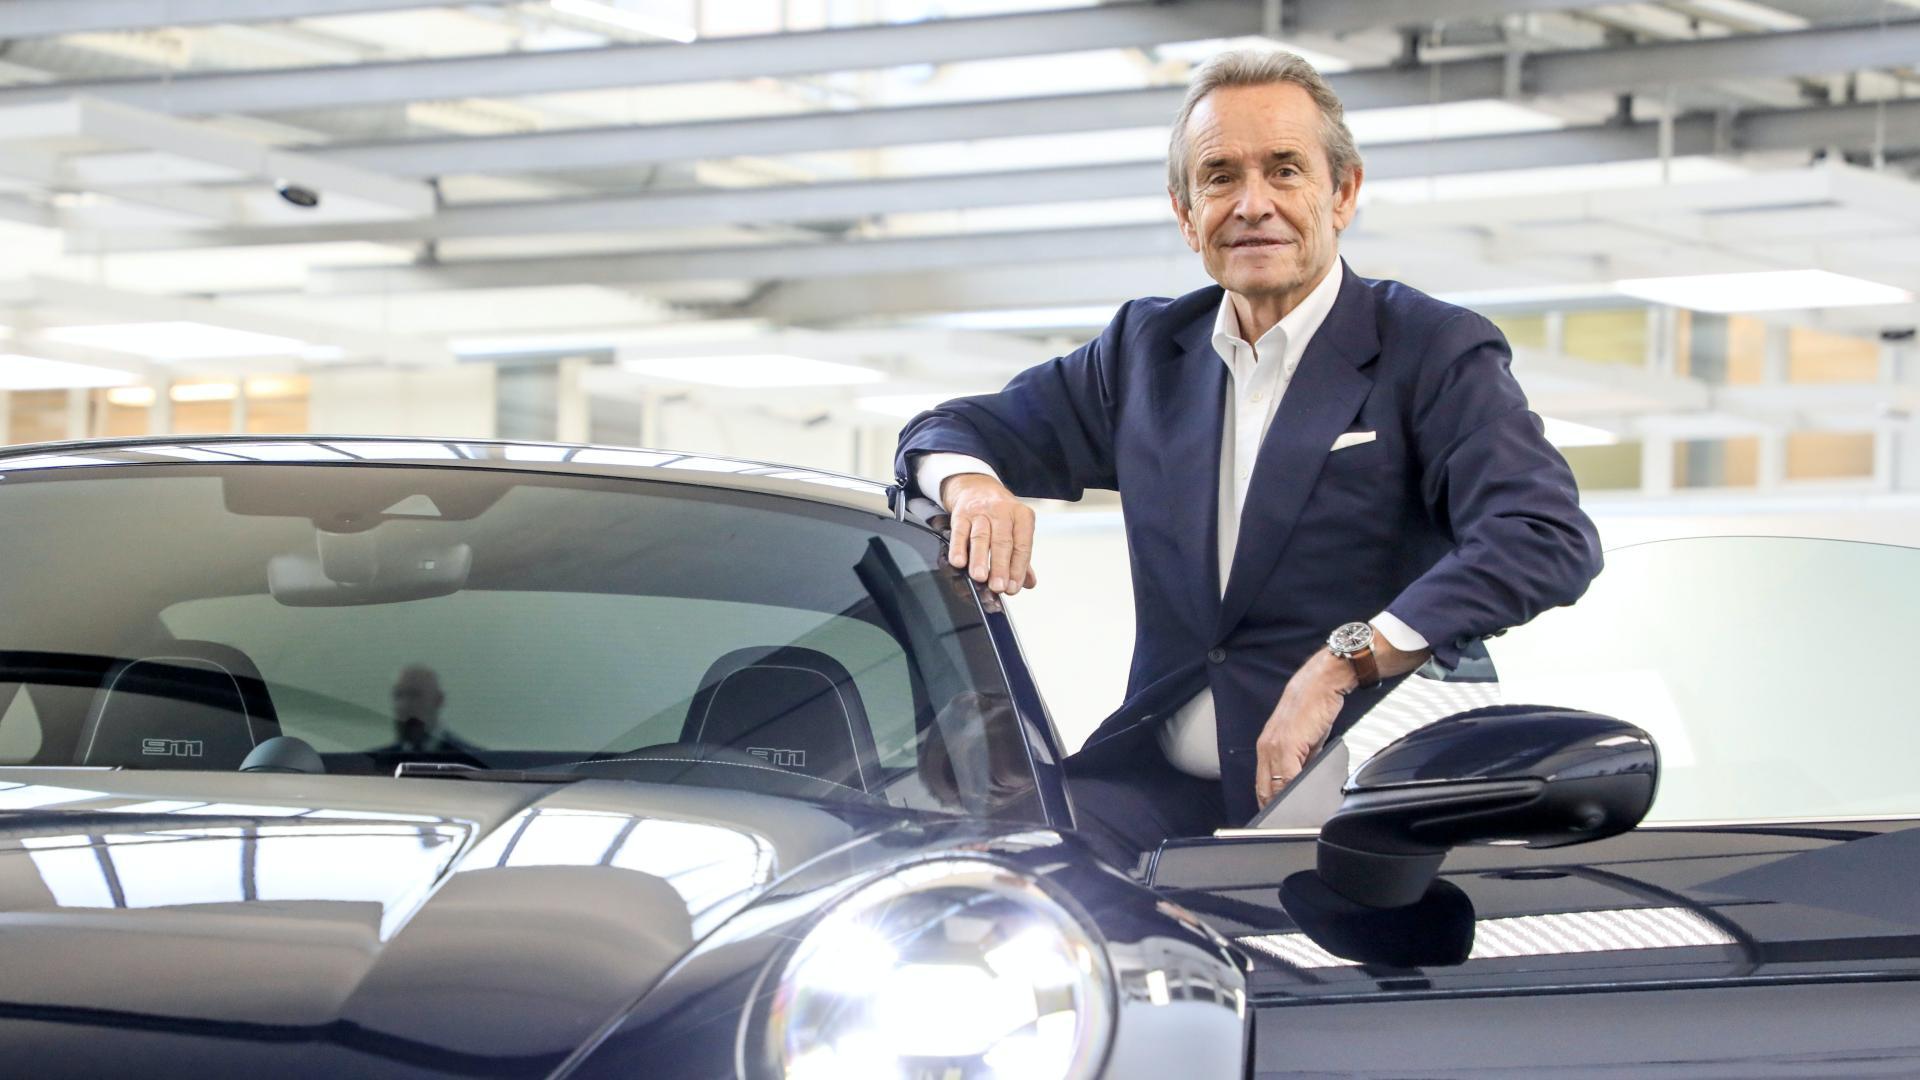 Porsche-911-Belgian-Legend-Edition-2020-Jacky-Ickx-1